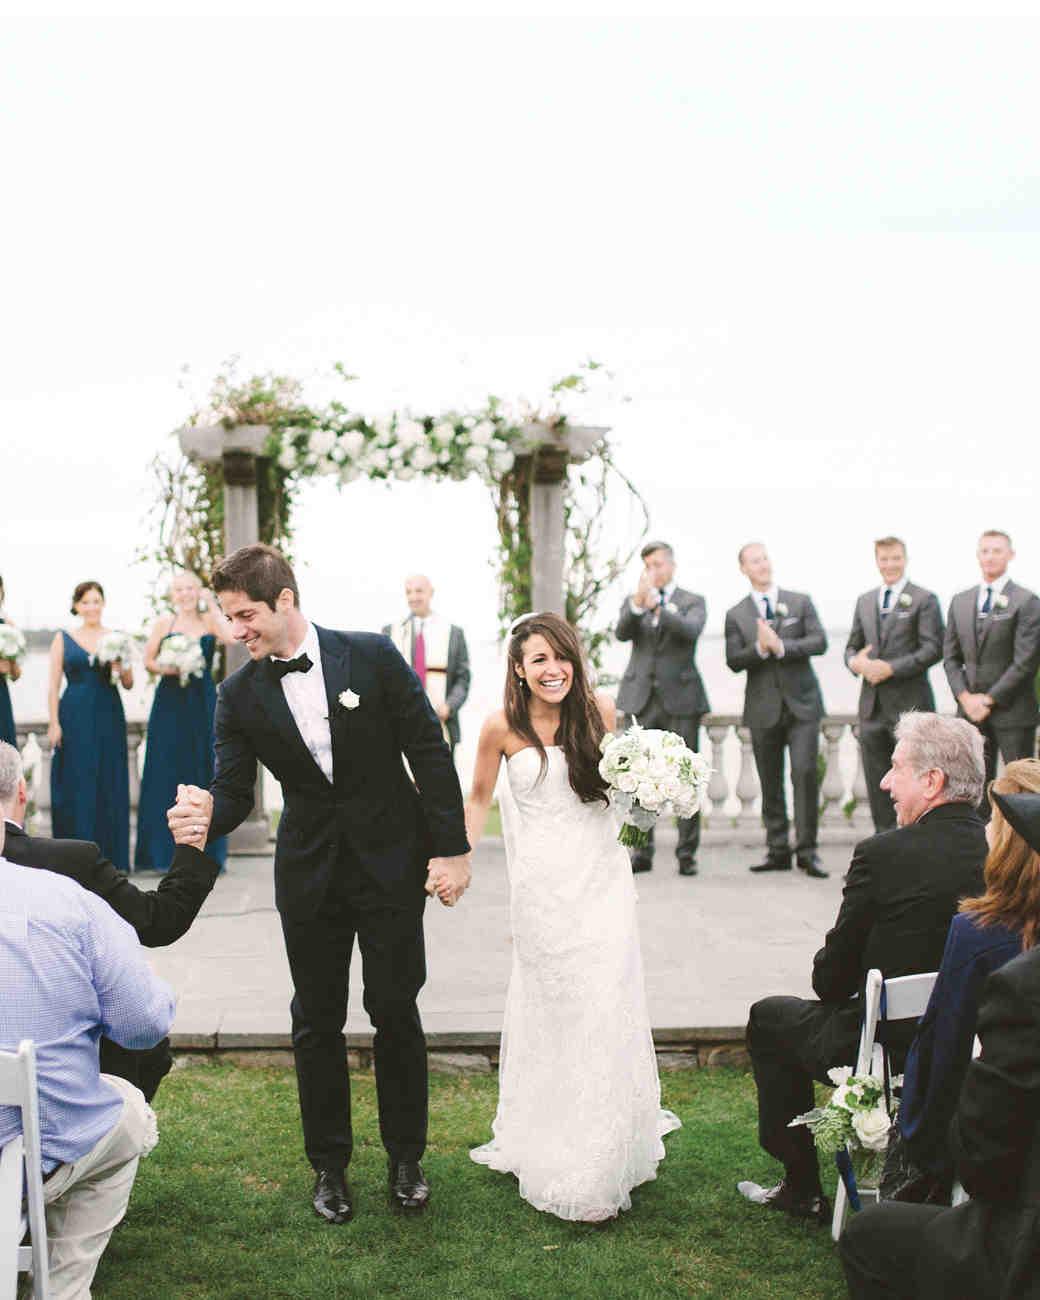 bride-groom-dsc-336-mwds110870.jpg